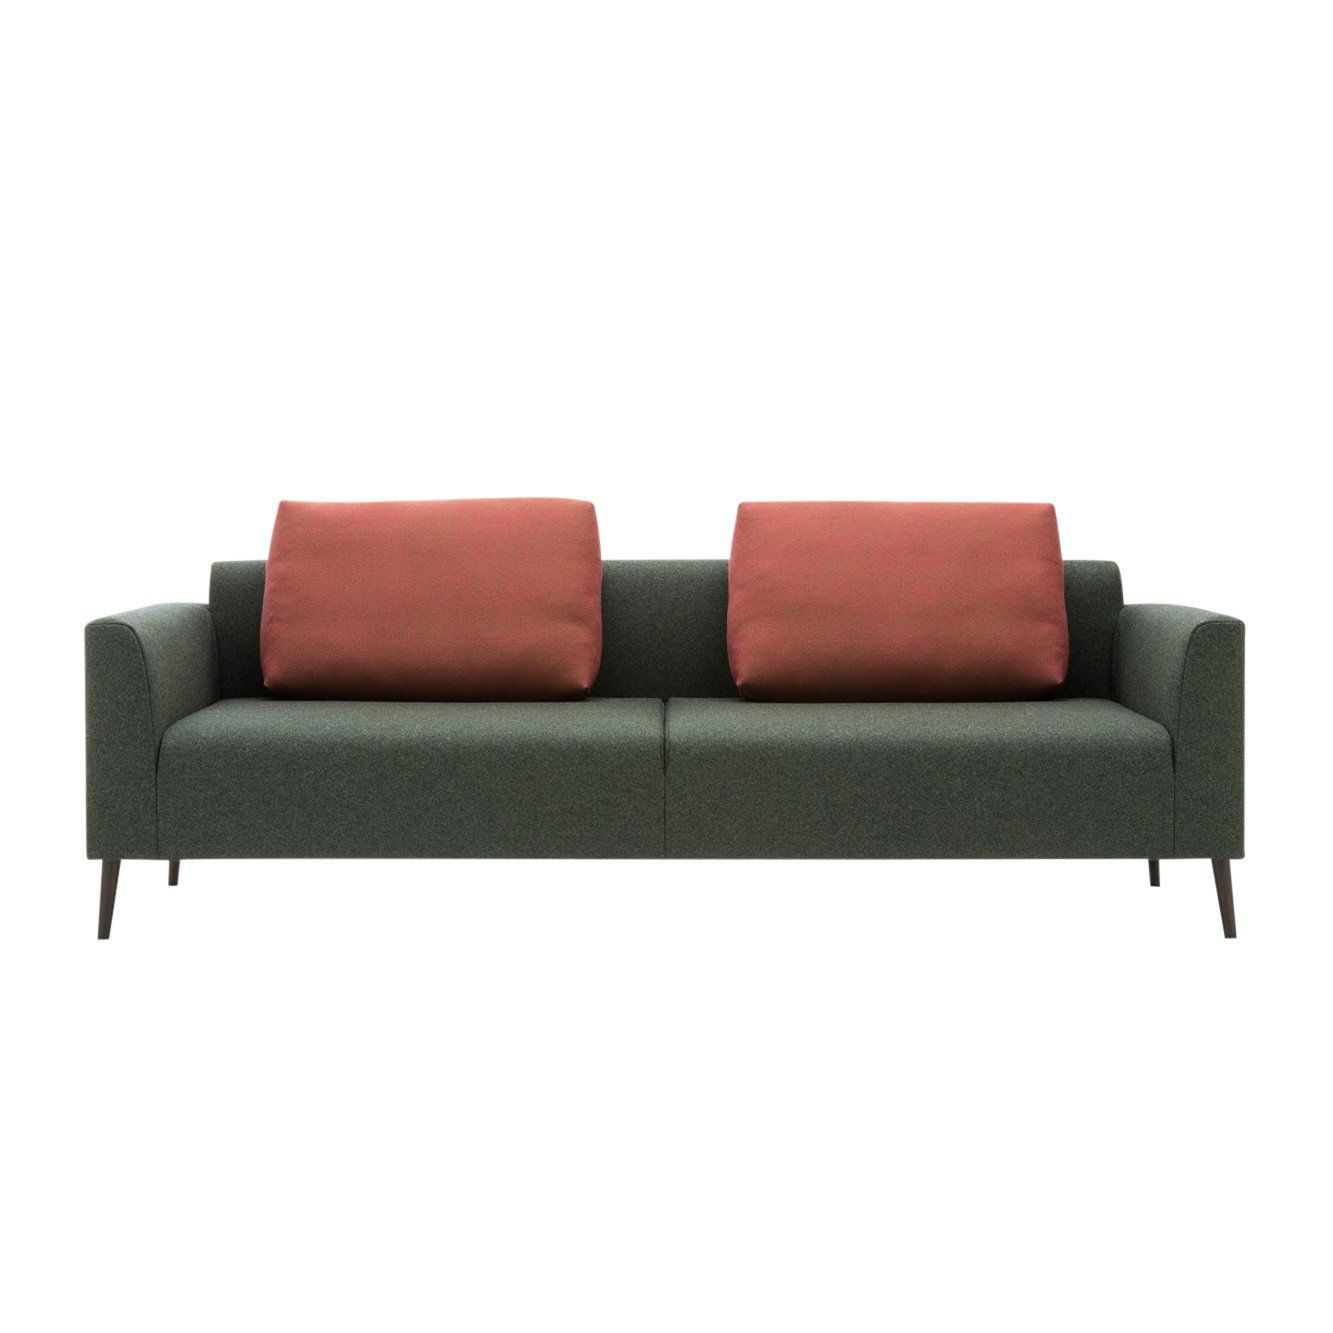 freistil 162 3-Sitzer Sofa | freistil Rolf Benz | AmbienteDirect.com